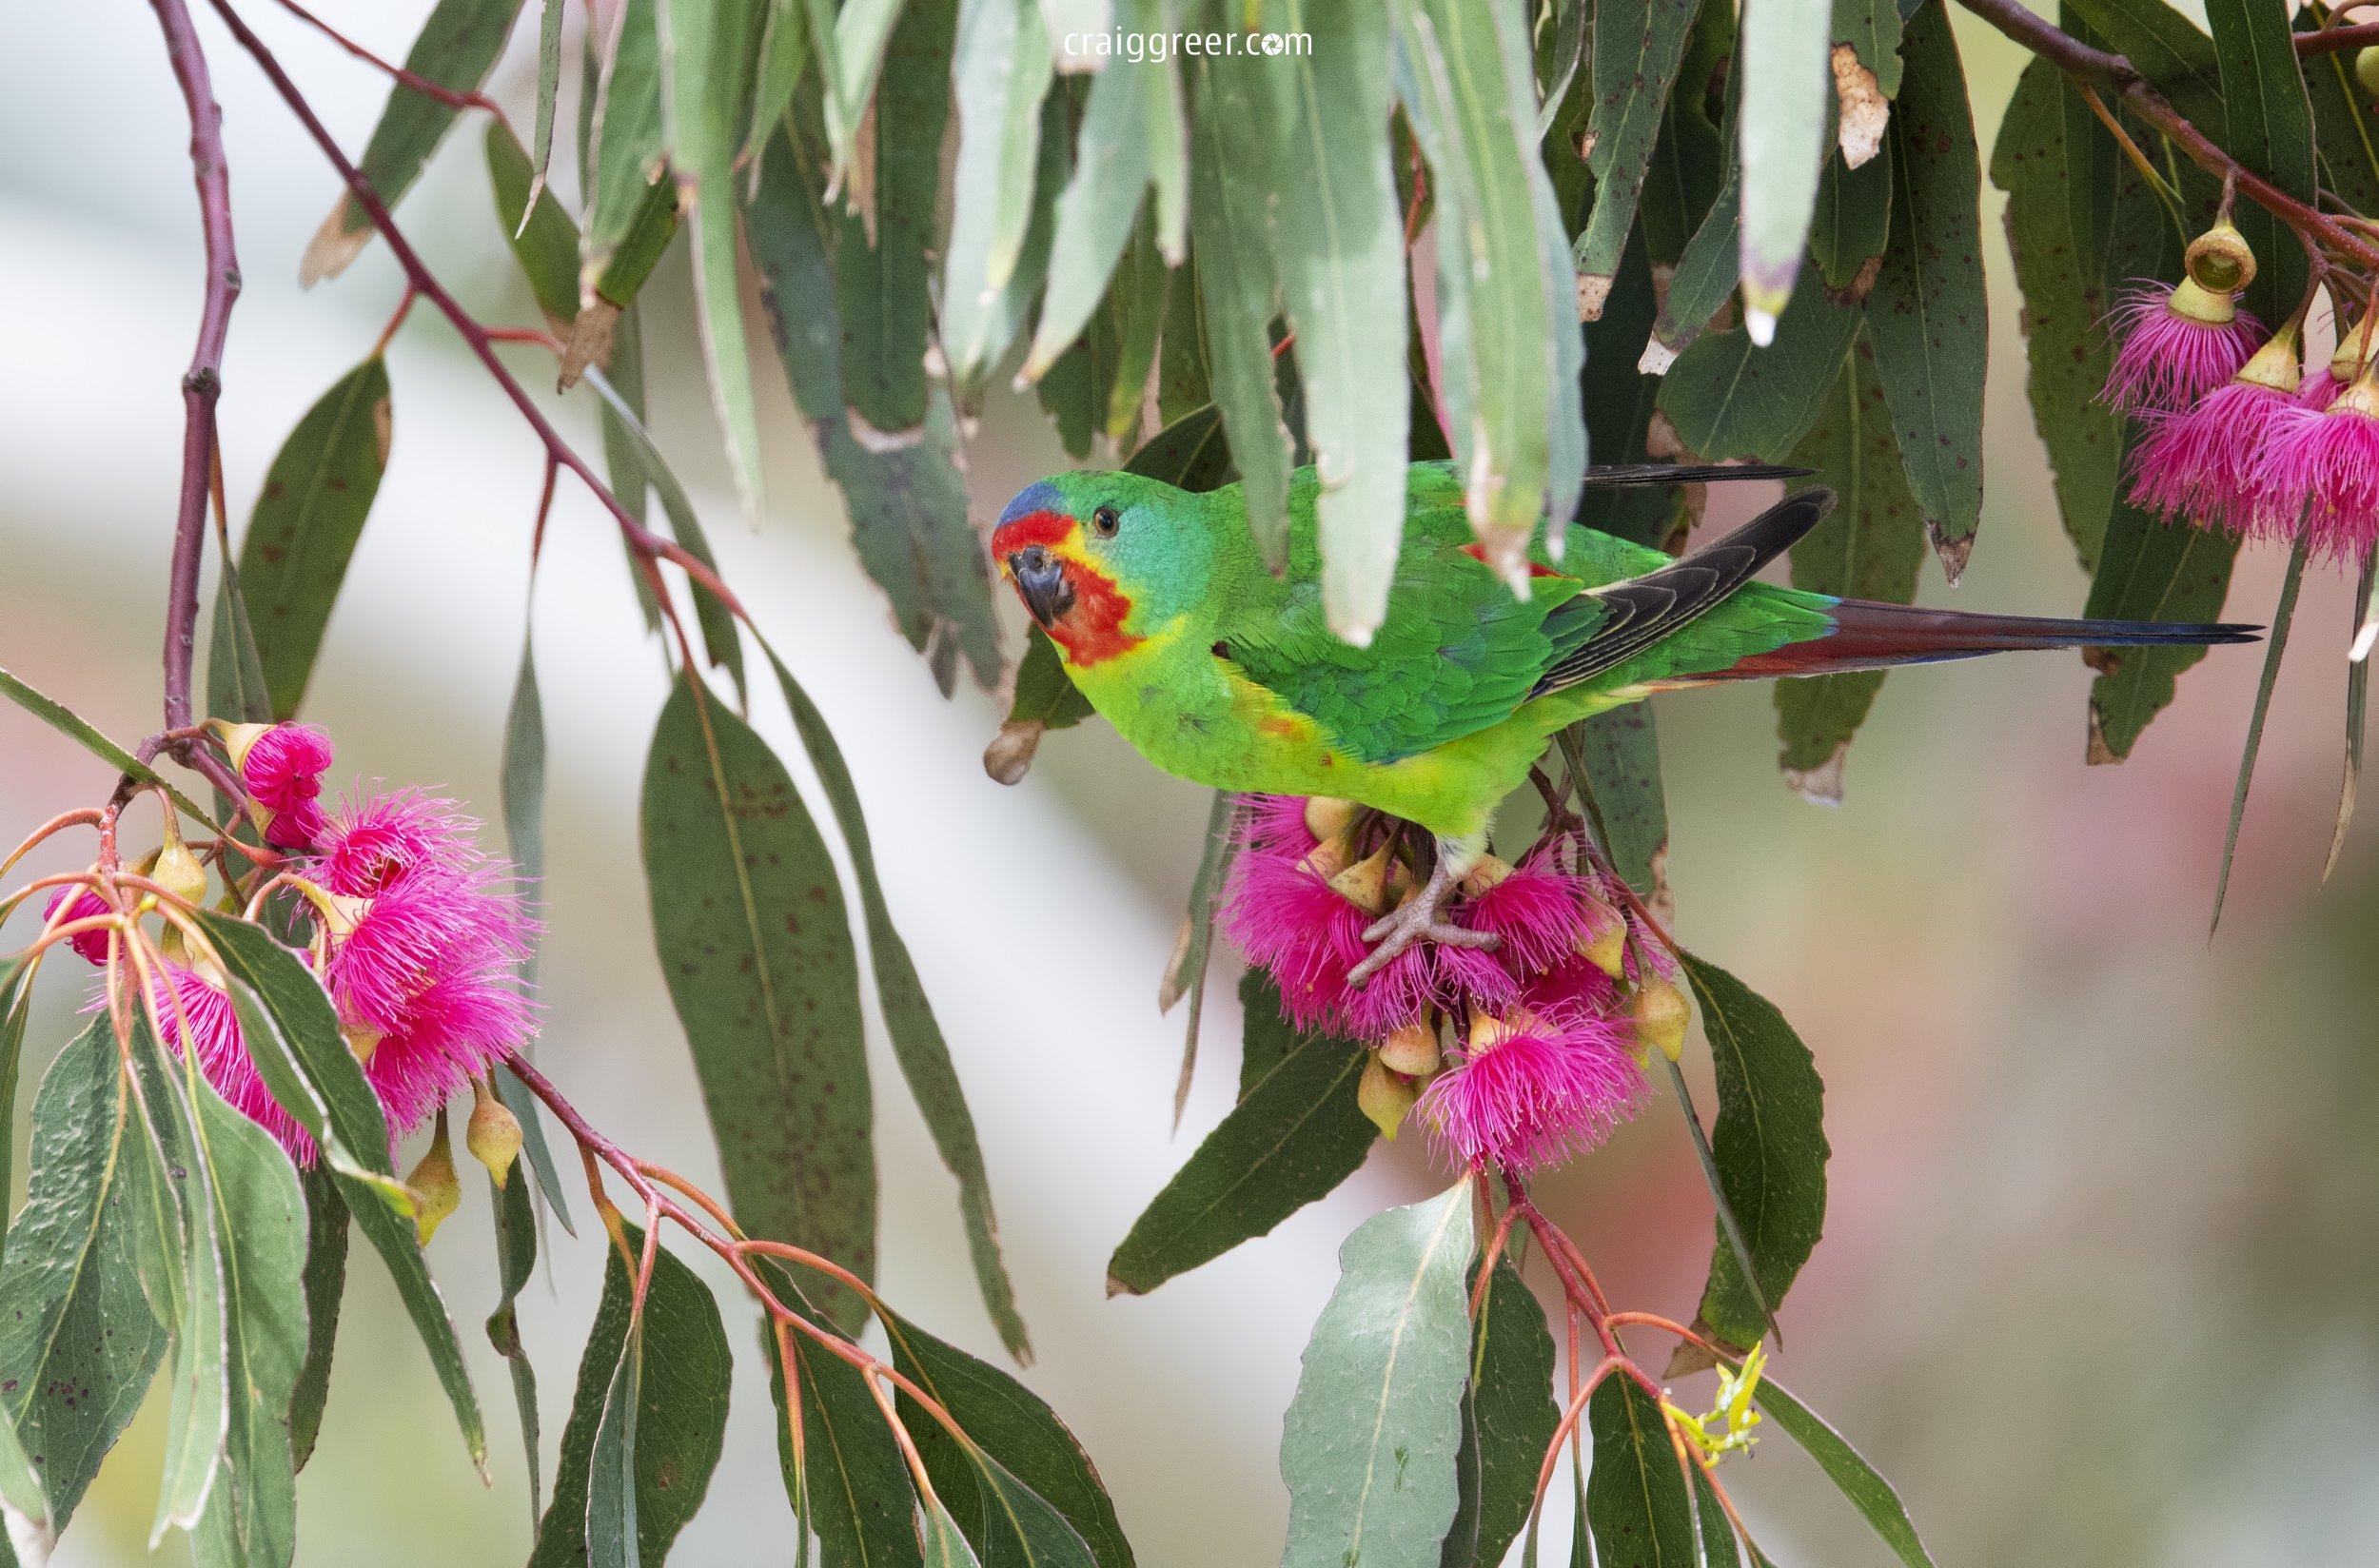 Swift-Parrot-Adventure-Bay-Bruny-Island-13-11-18.jpg